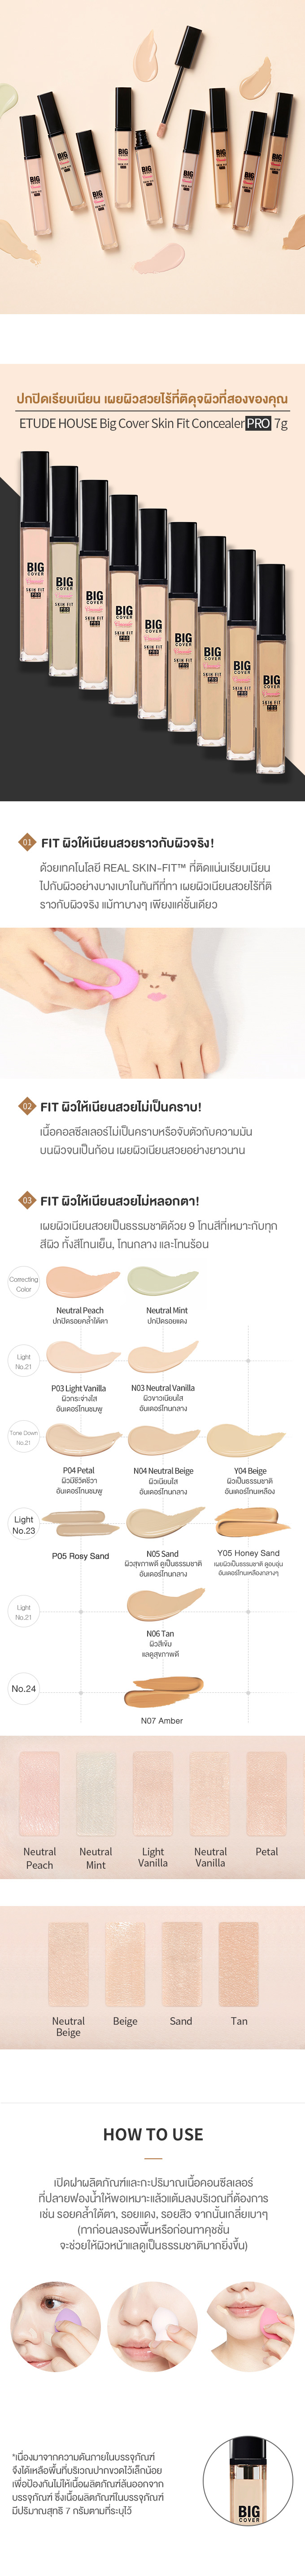 TH1_Description_Big-Cover-Skin-Fit-Concealer-PRO_w